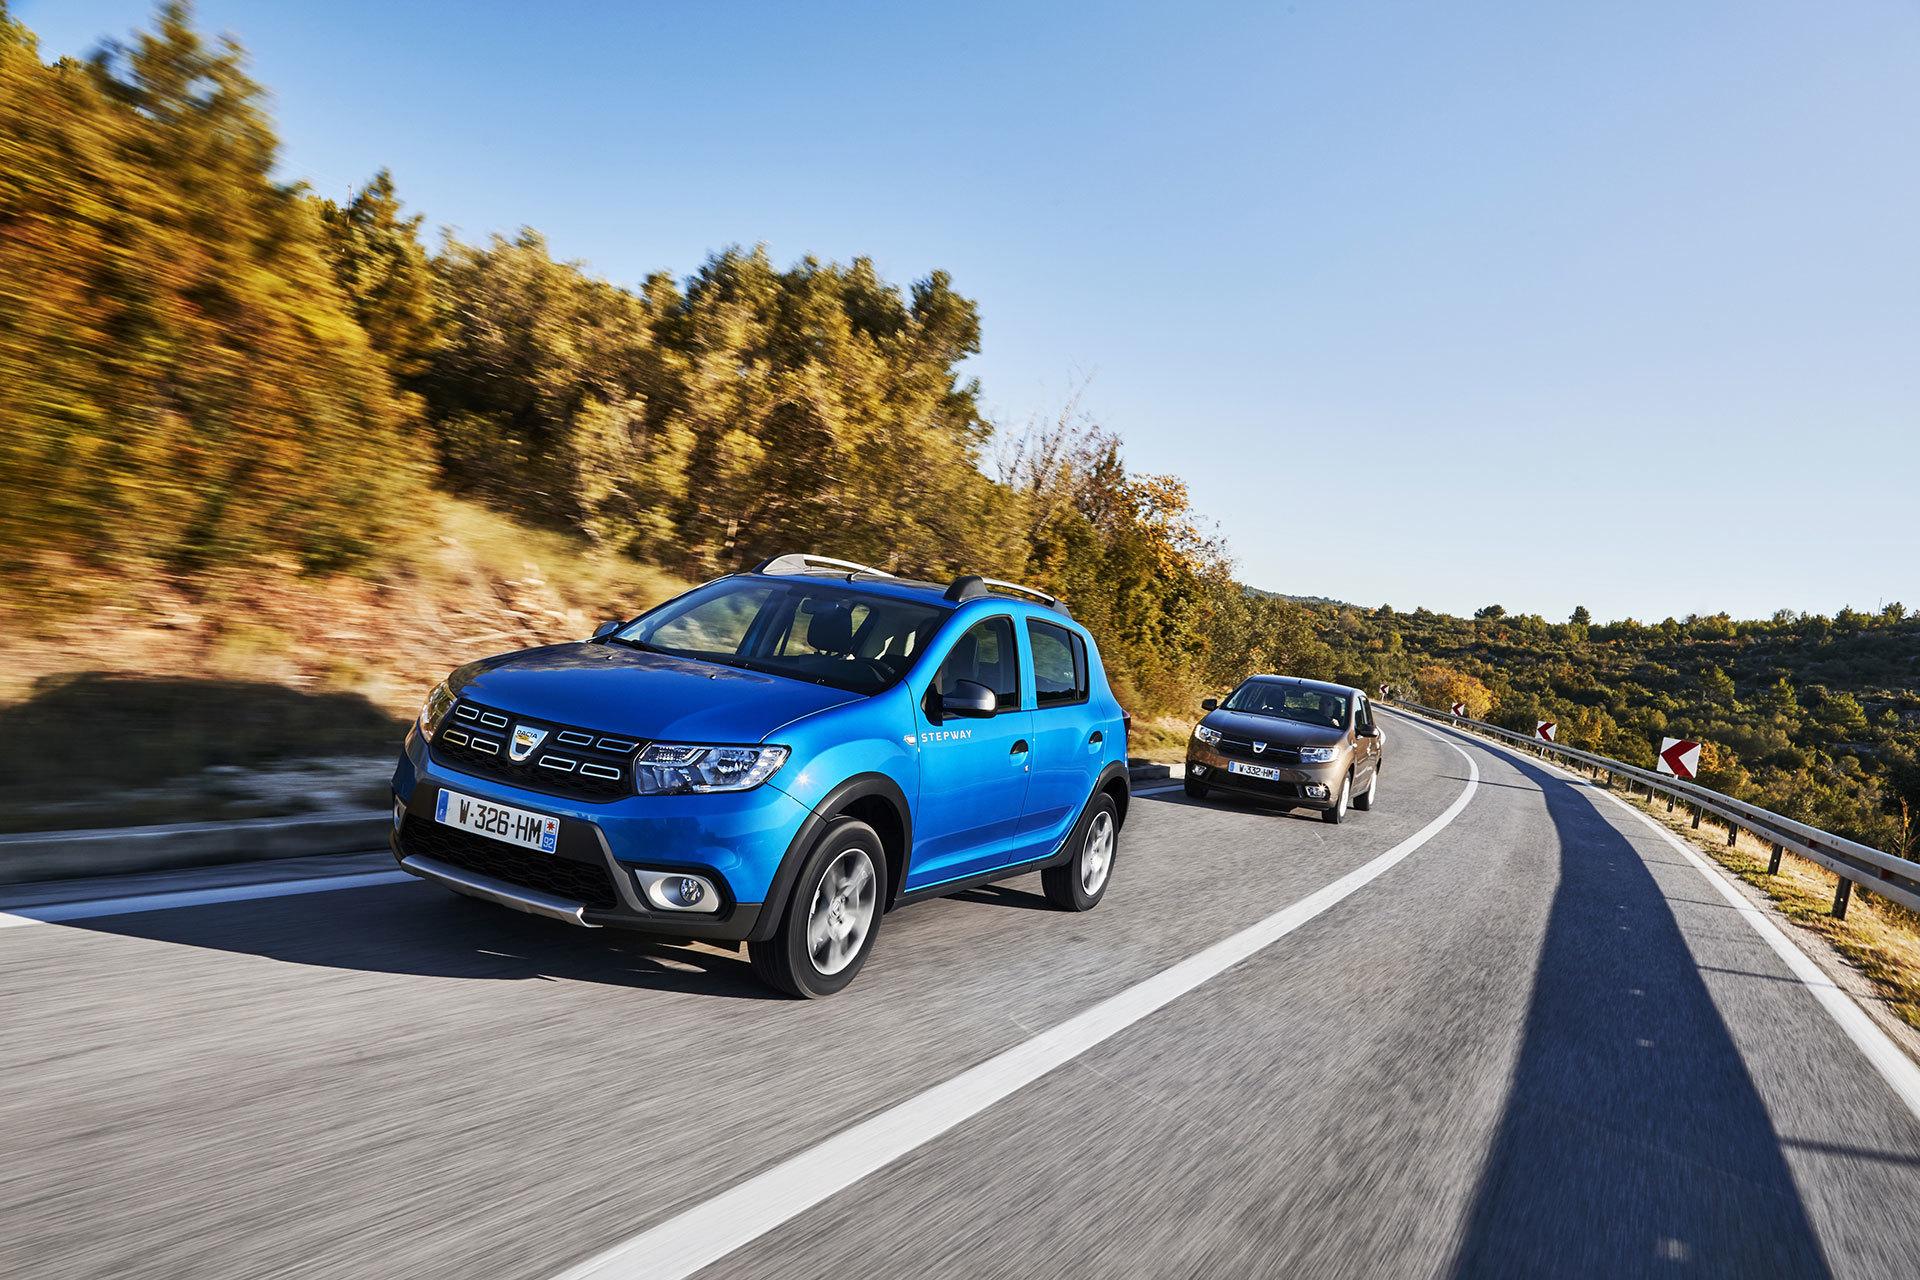 Dacia Sandero Stepway 2019 Azul 07